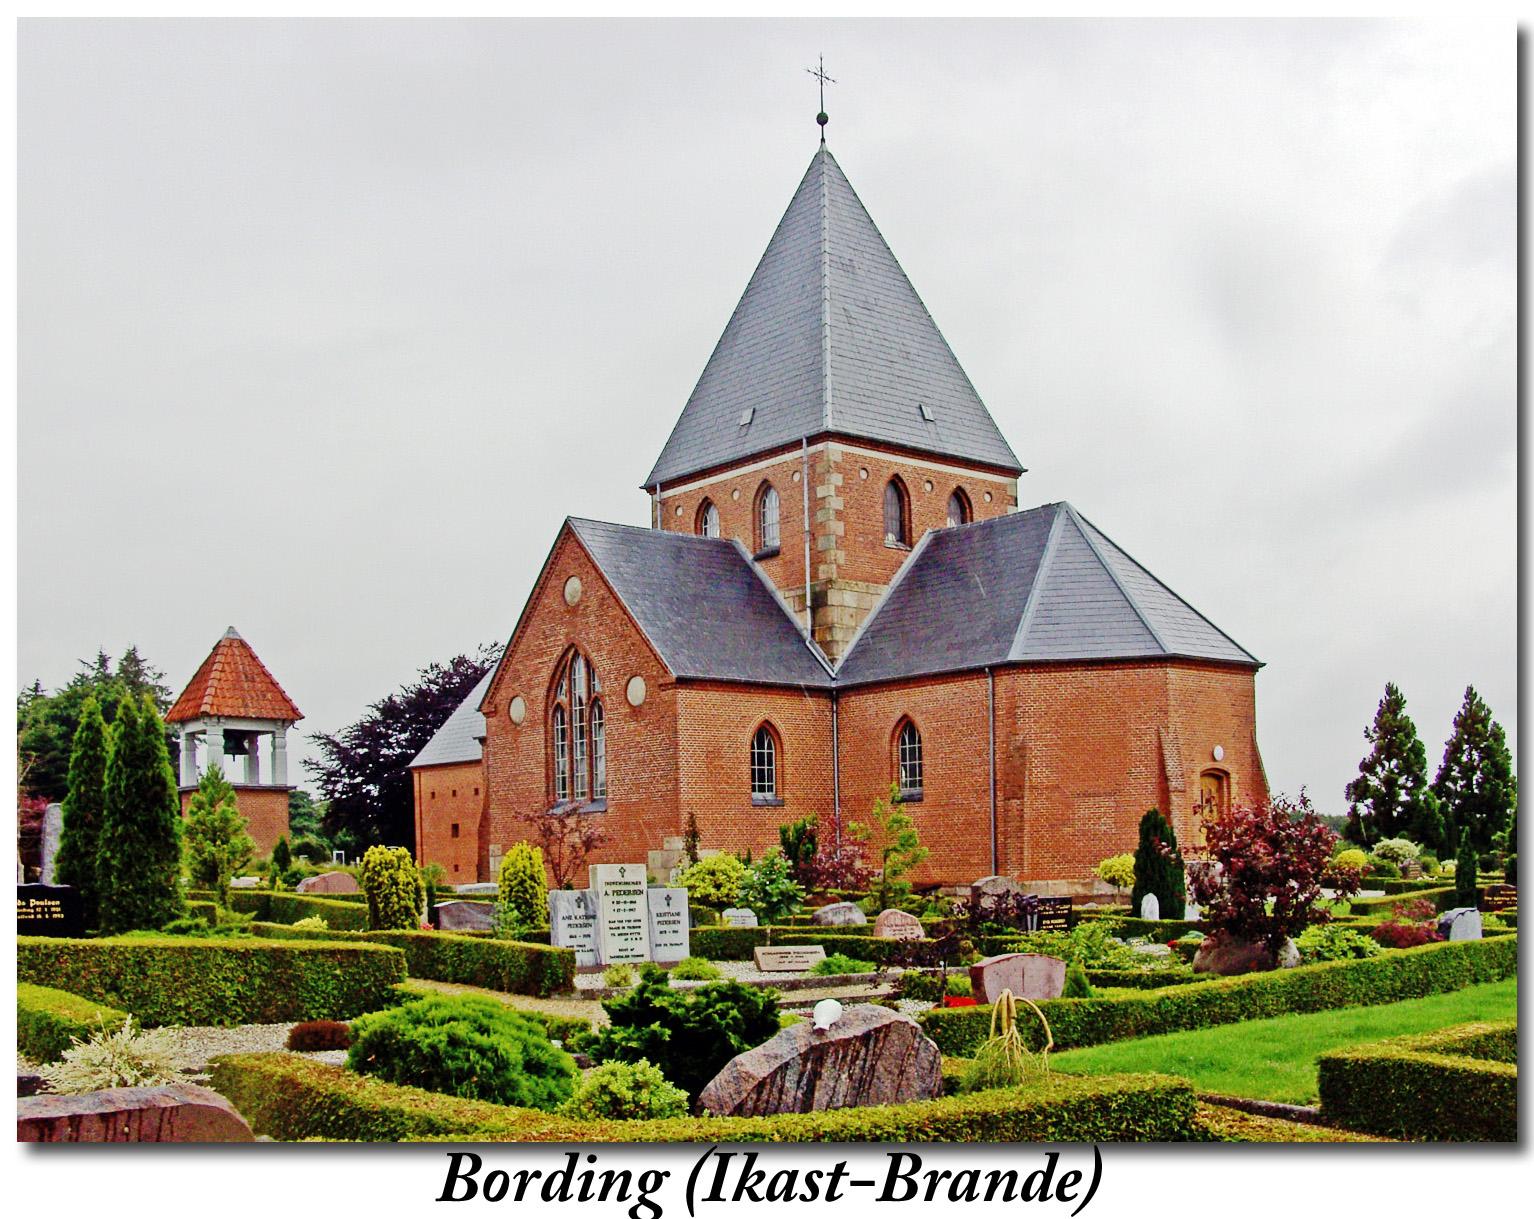 dansk date Ikast-Brande